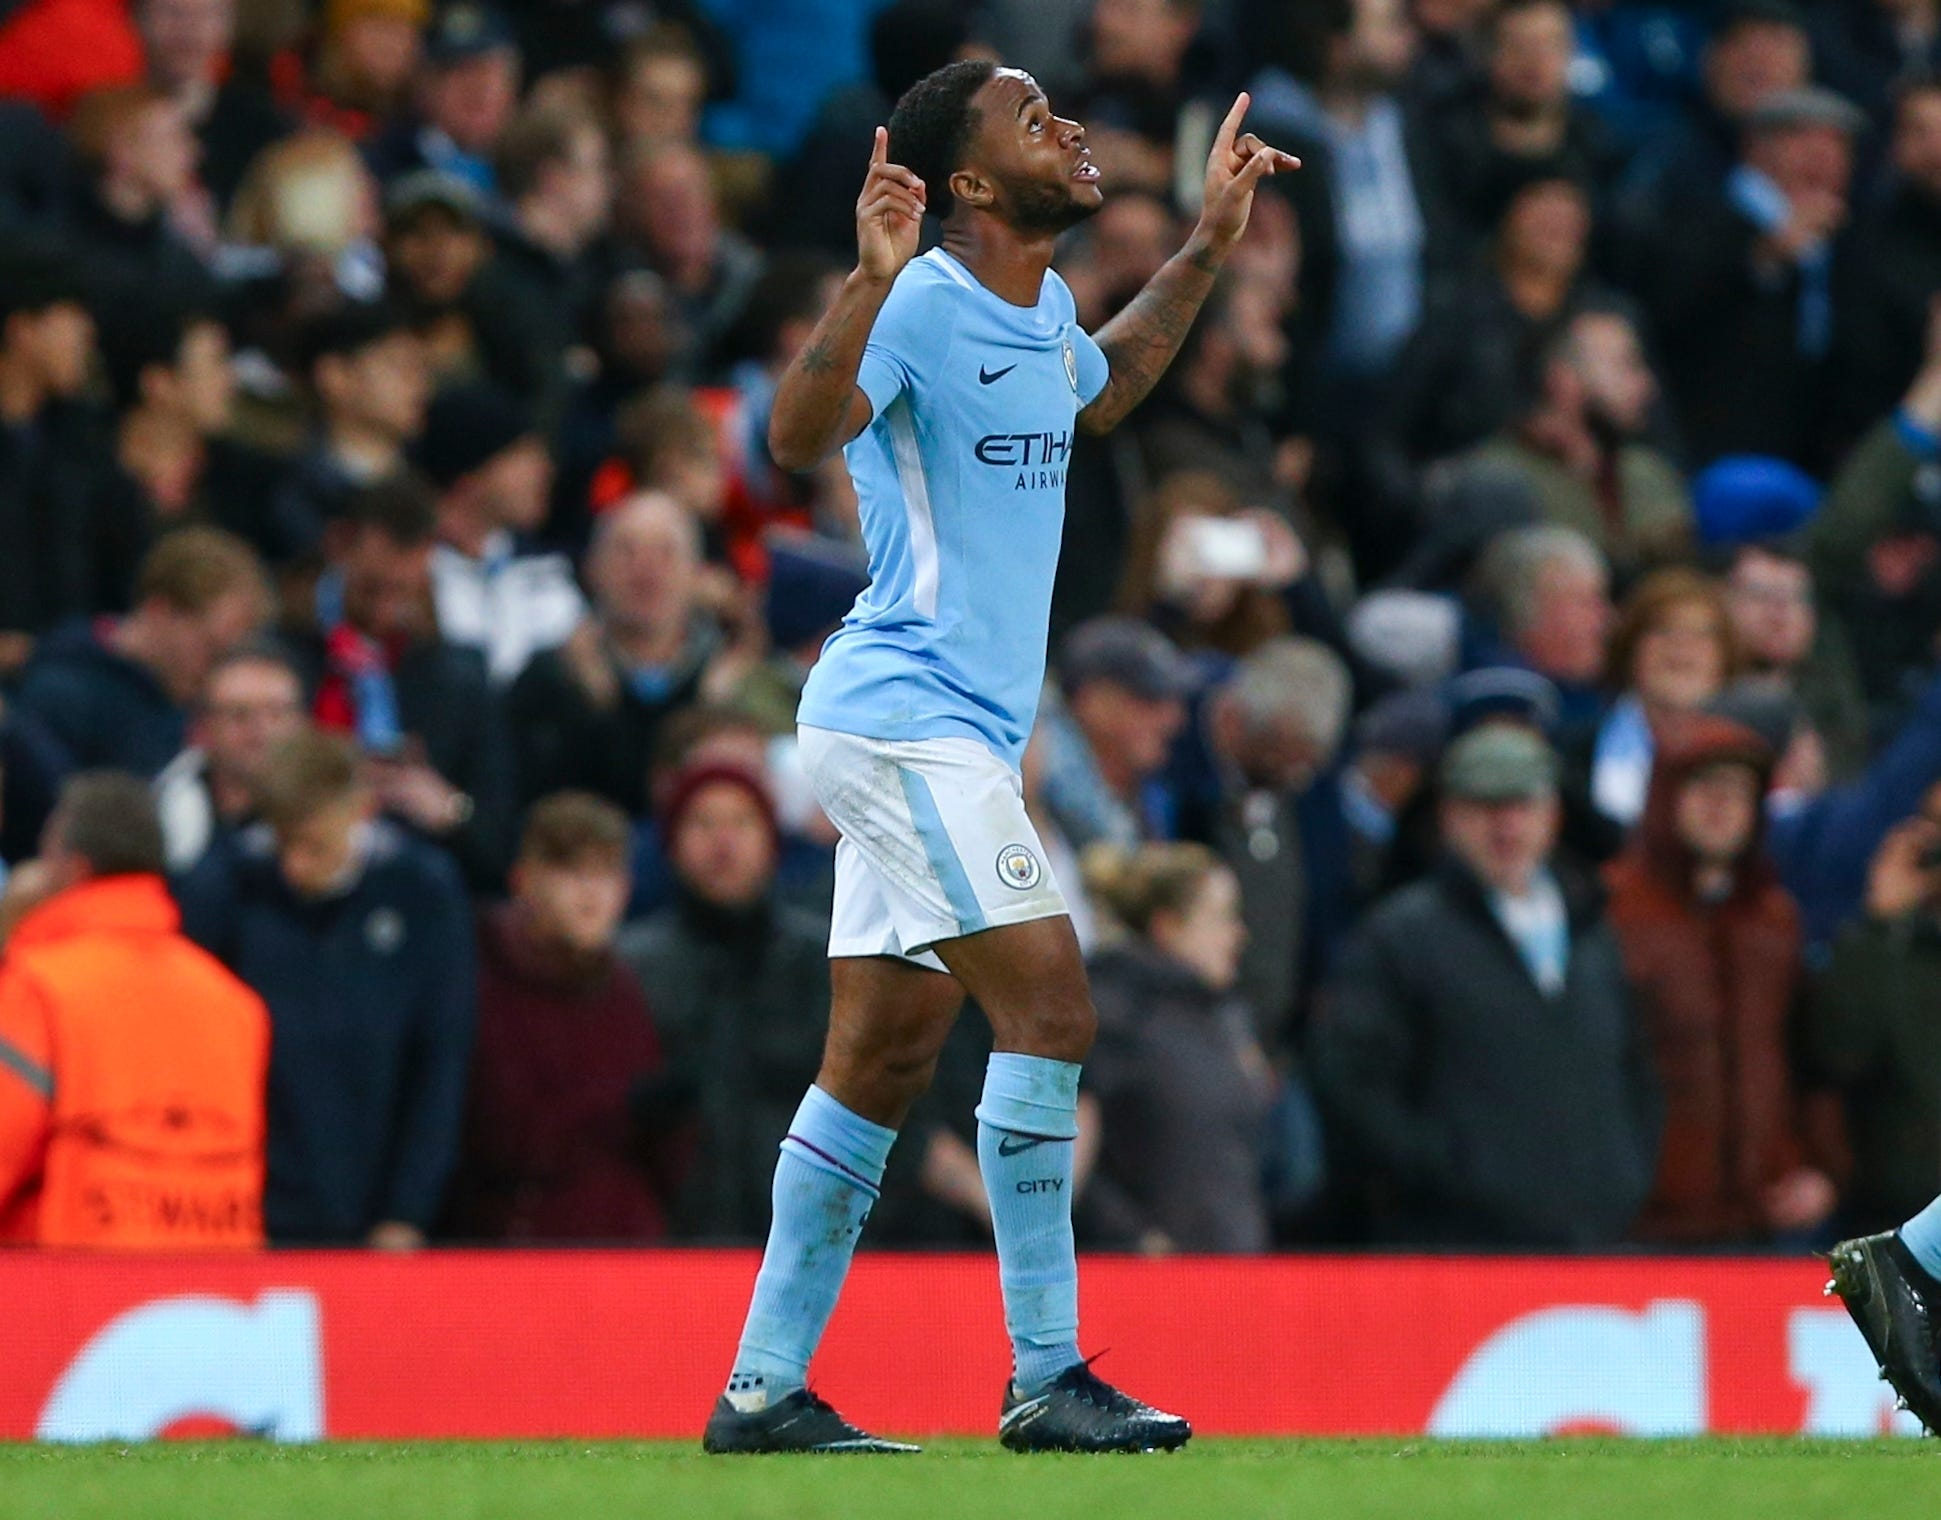 Man City beats Feyenoord 1-0 to win Champions League group